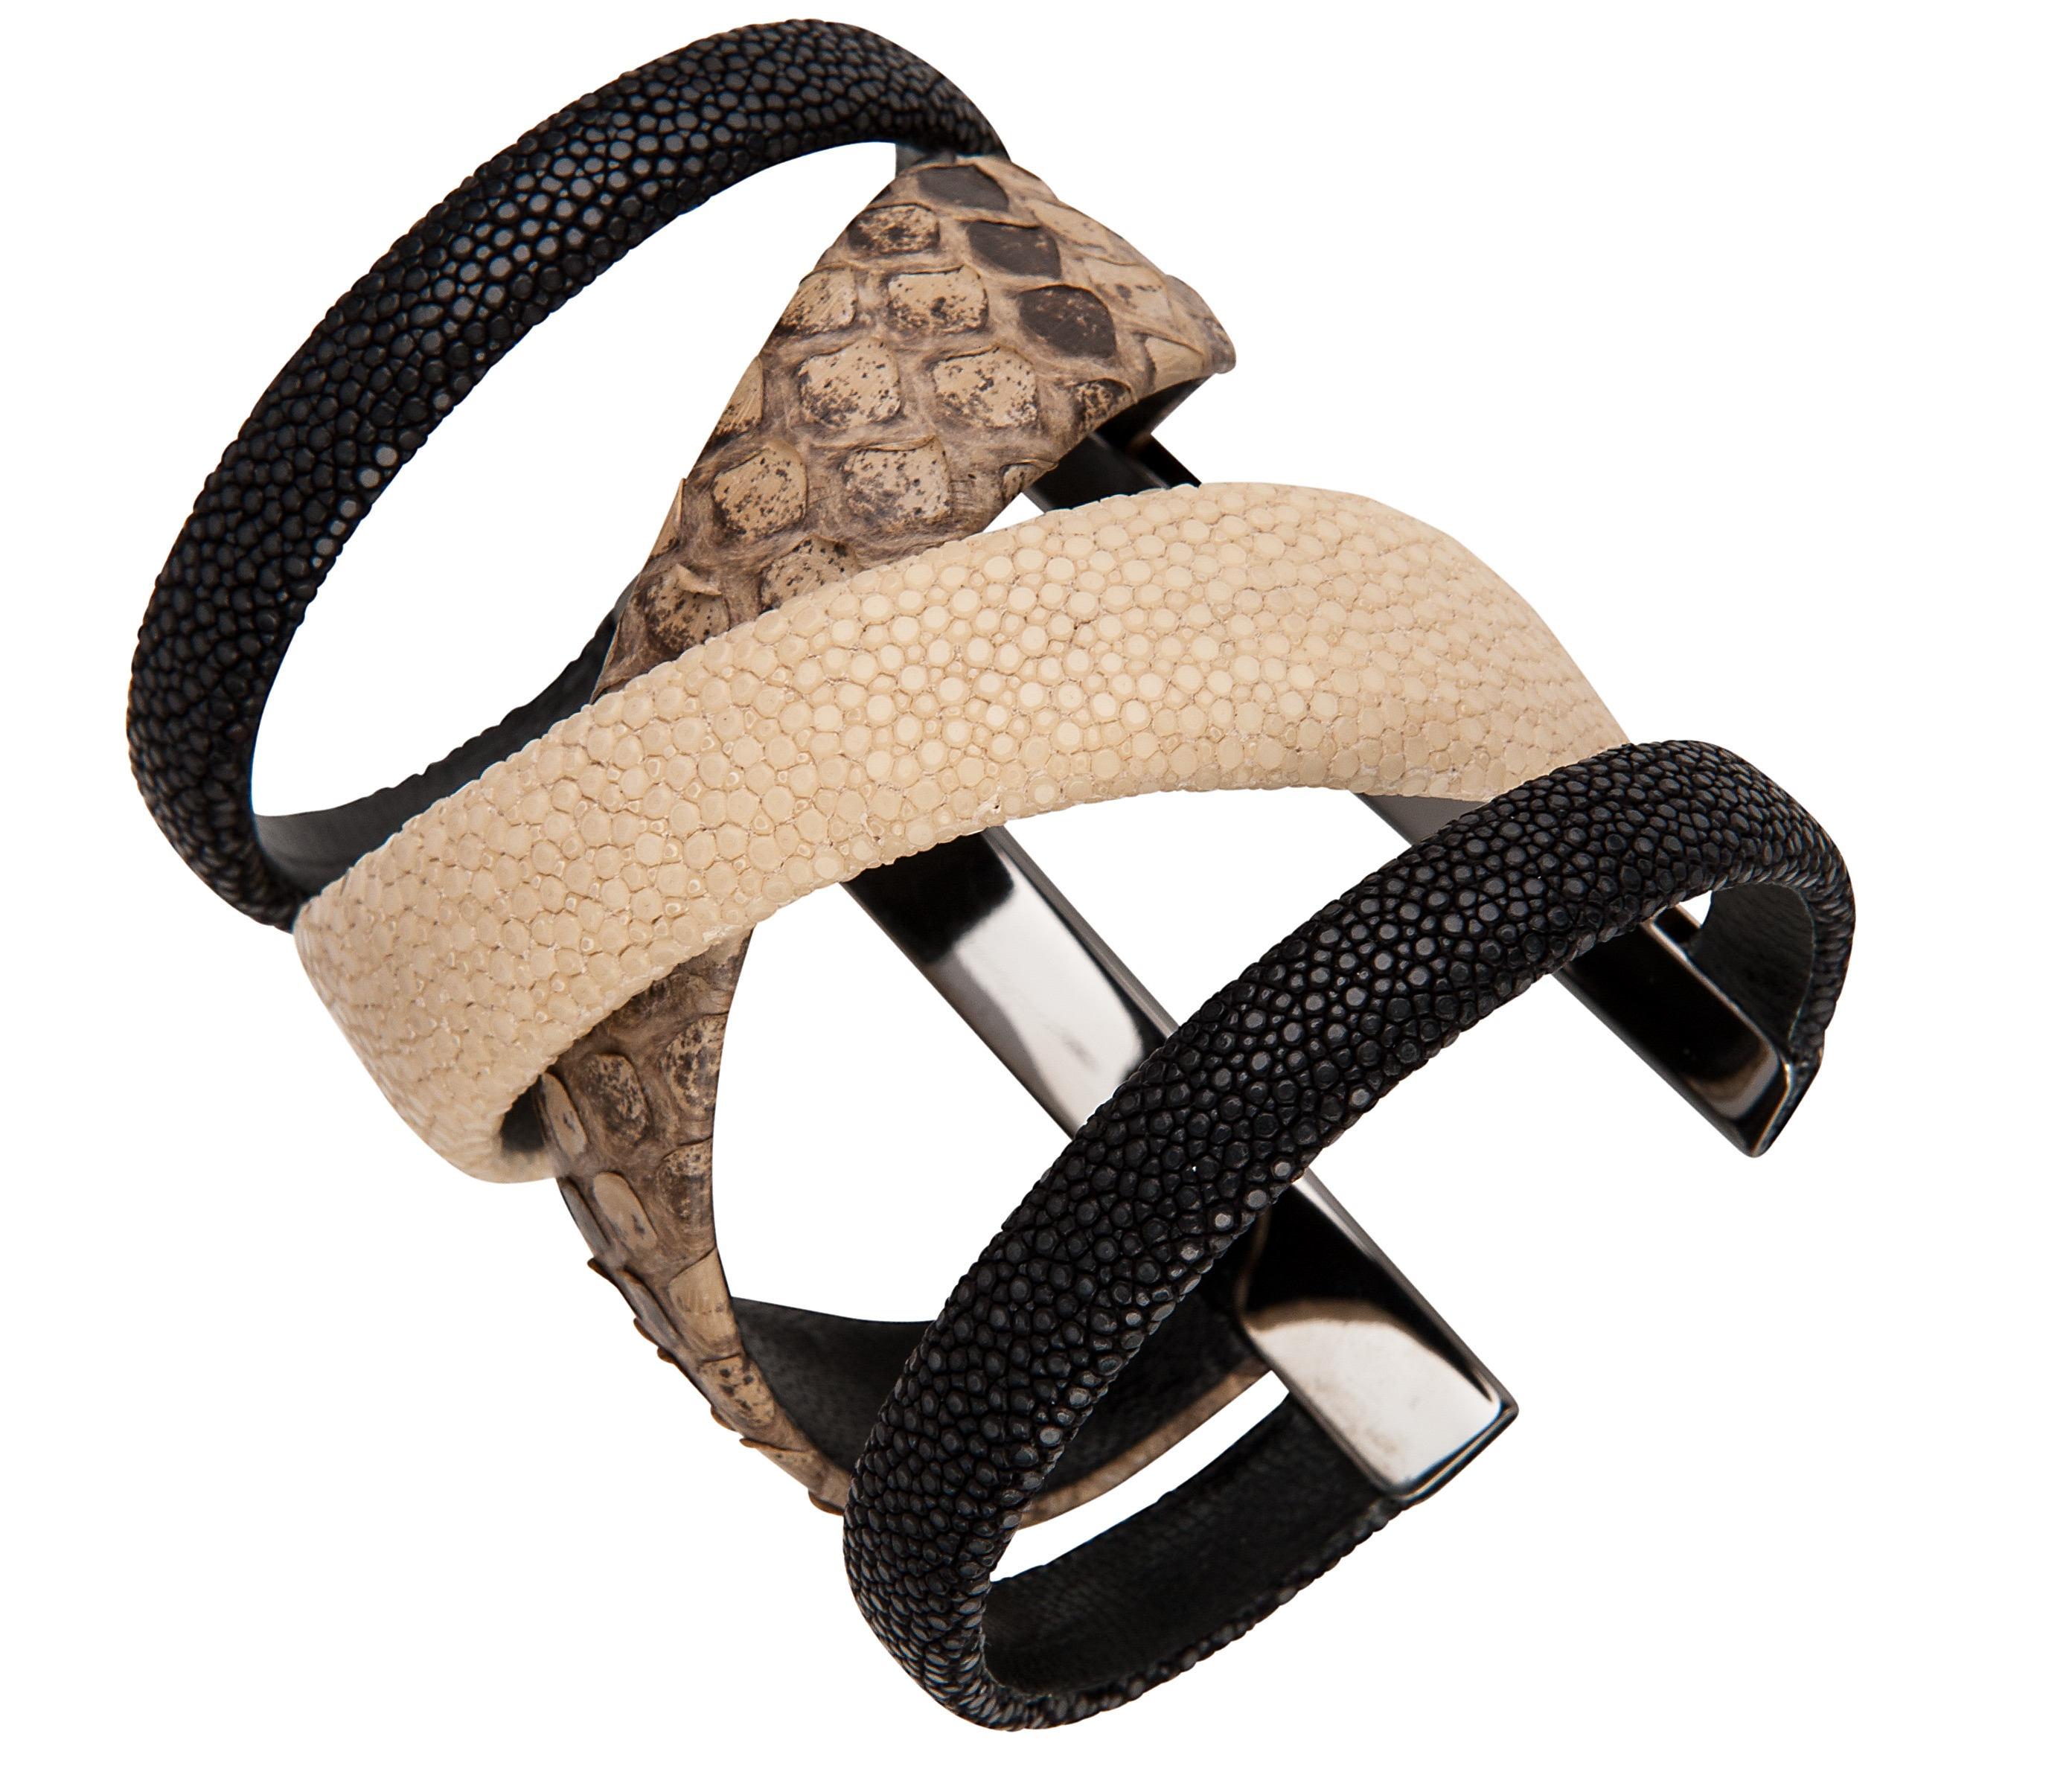 Cristina Sabatini Gladiator cuff bracelet | JCK On Your Market